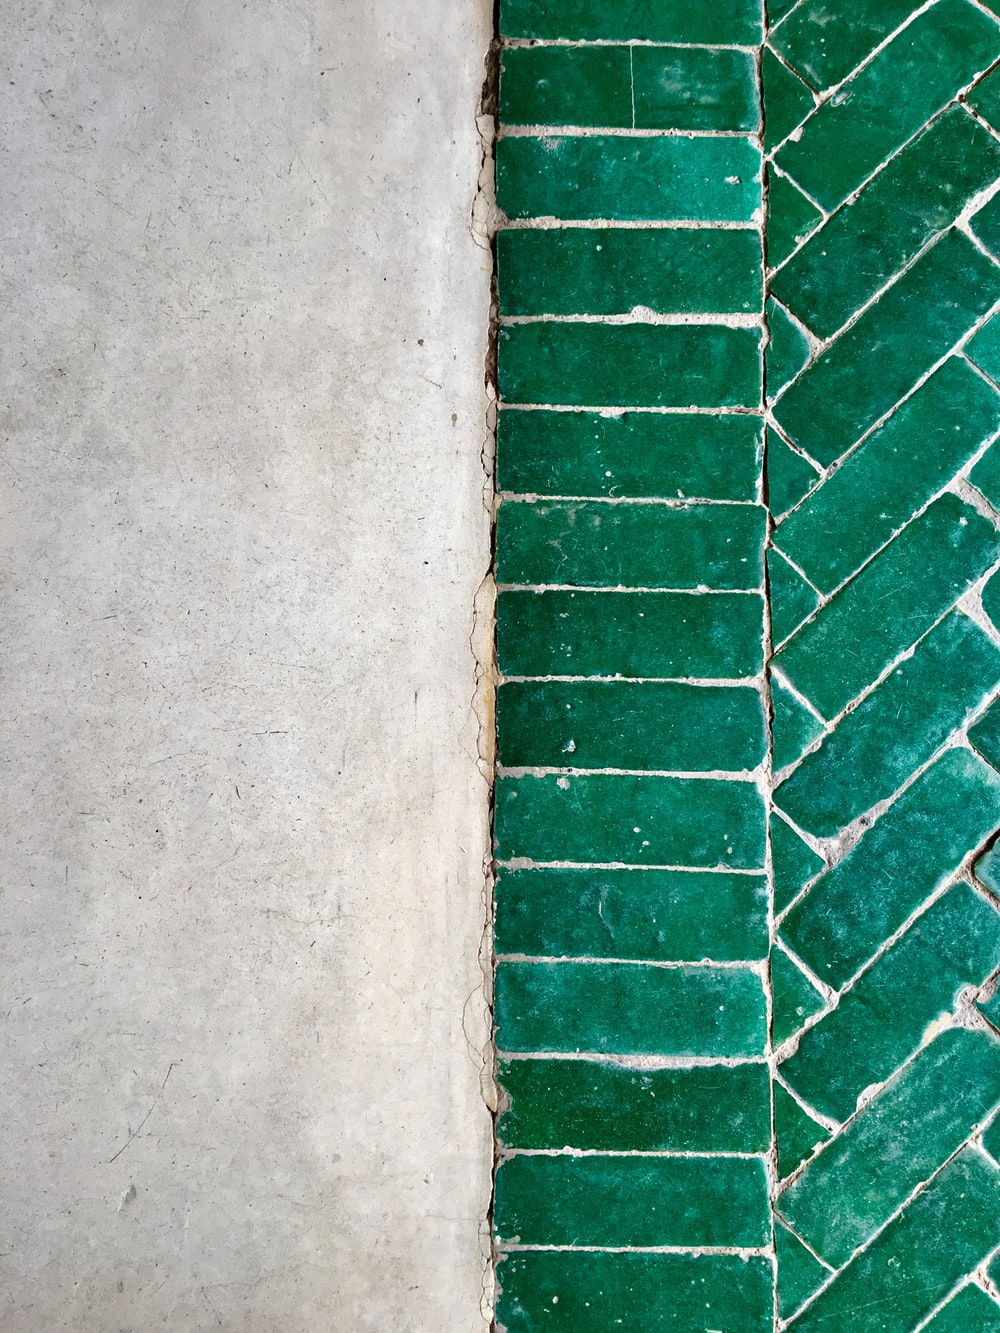 green tiled pavement